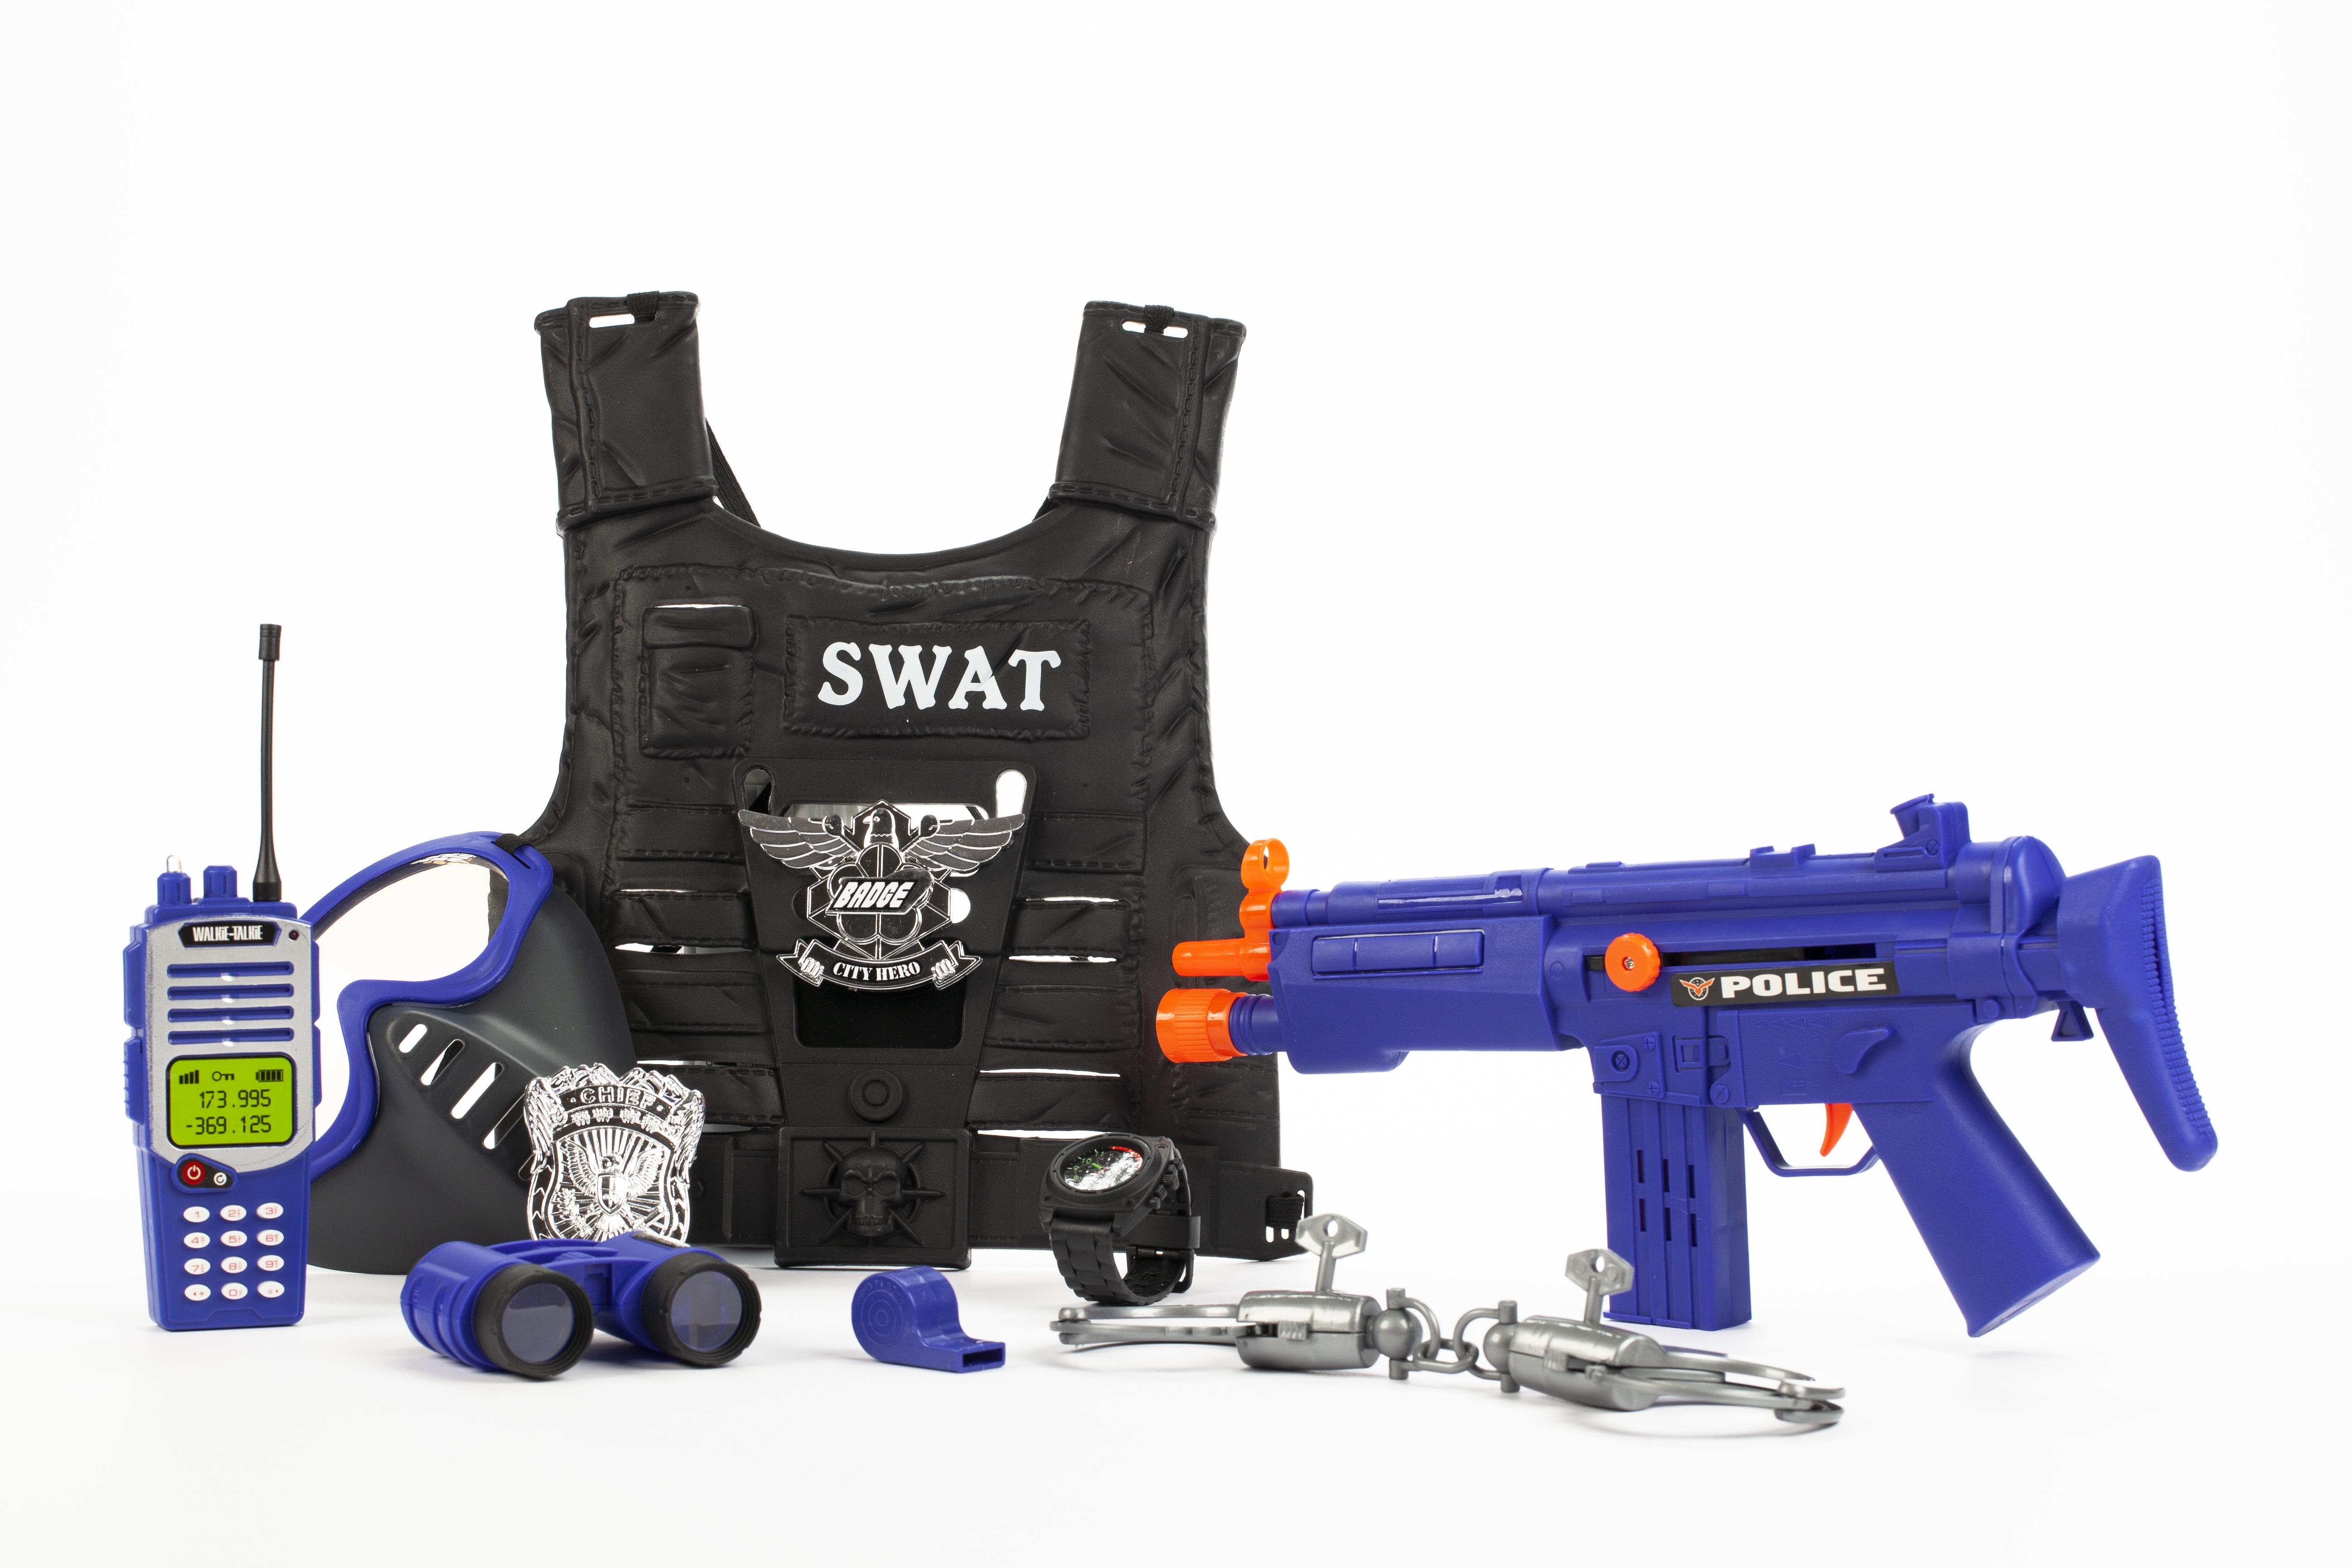 S.W.A.T Set - Large Box (520360)